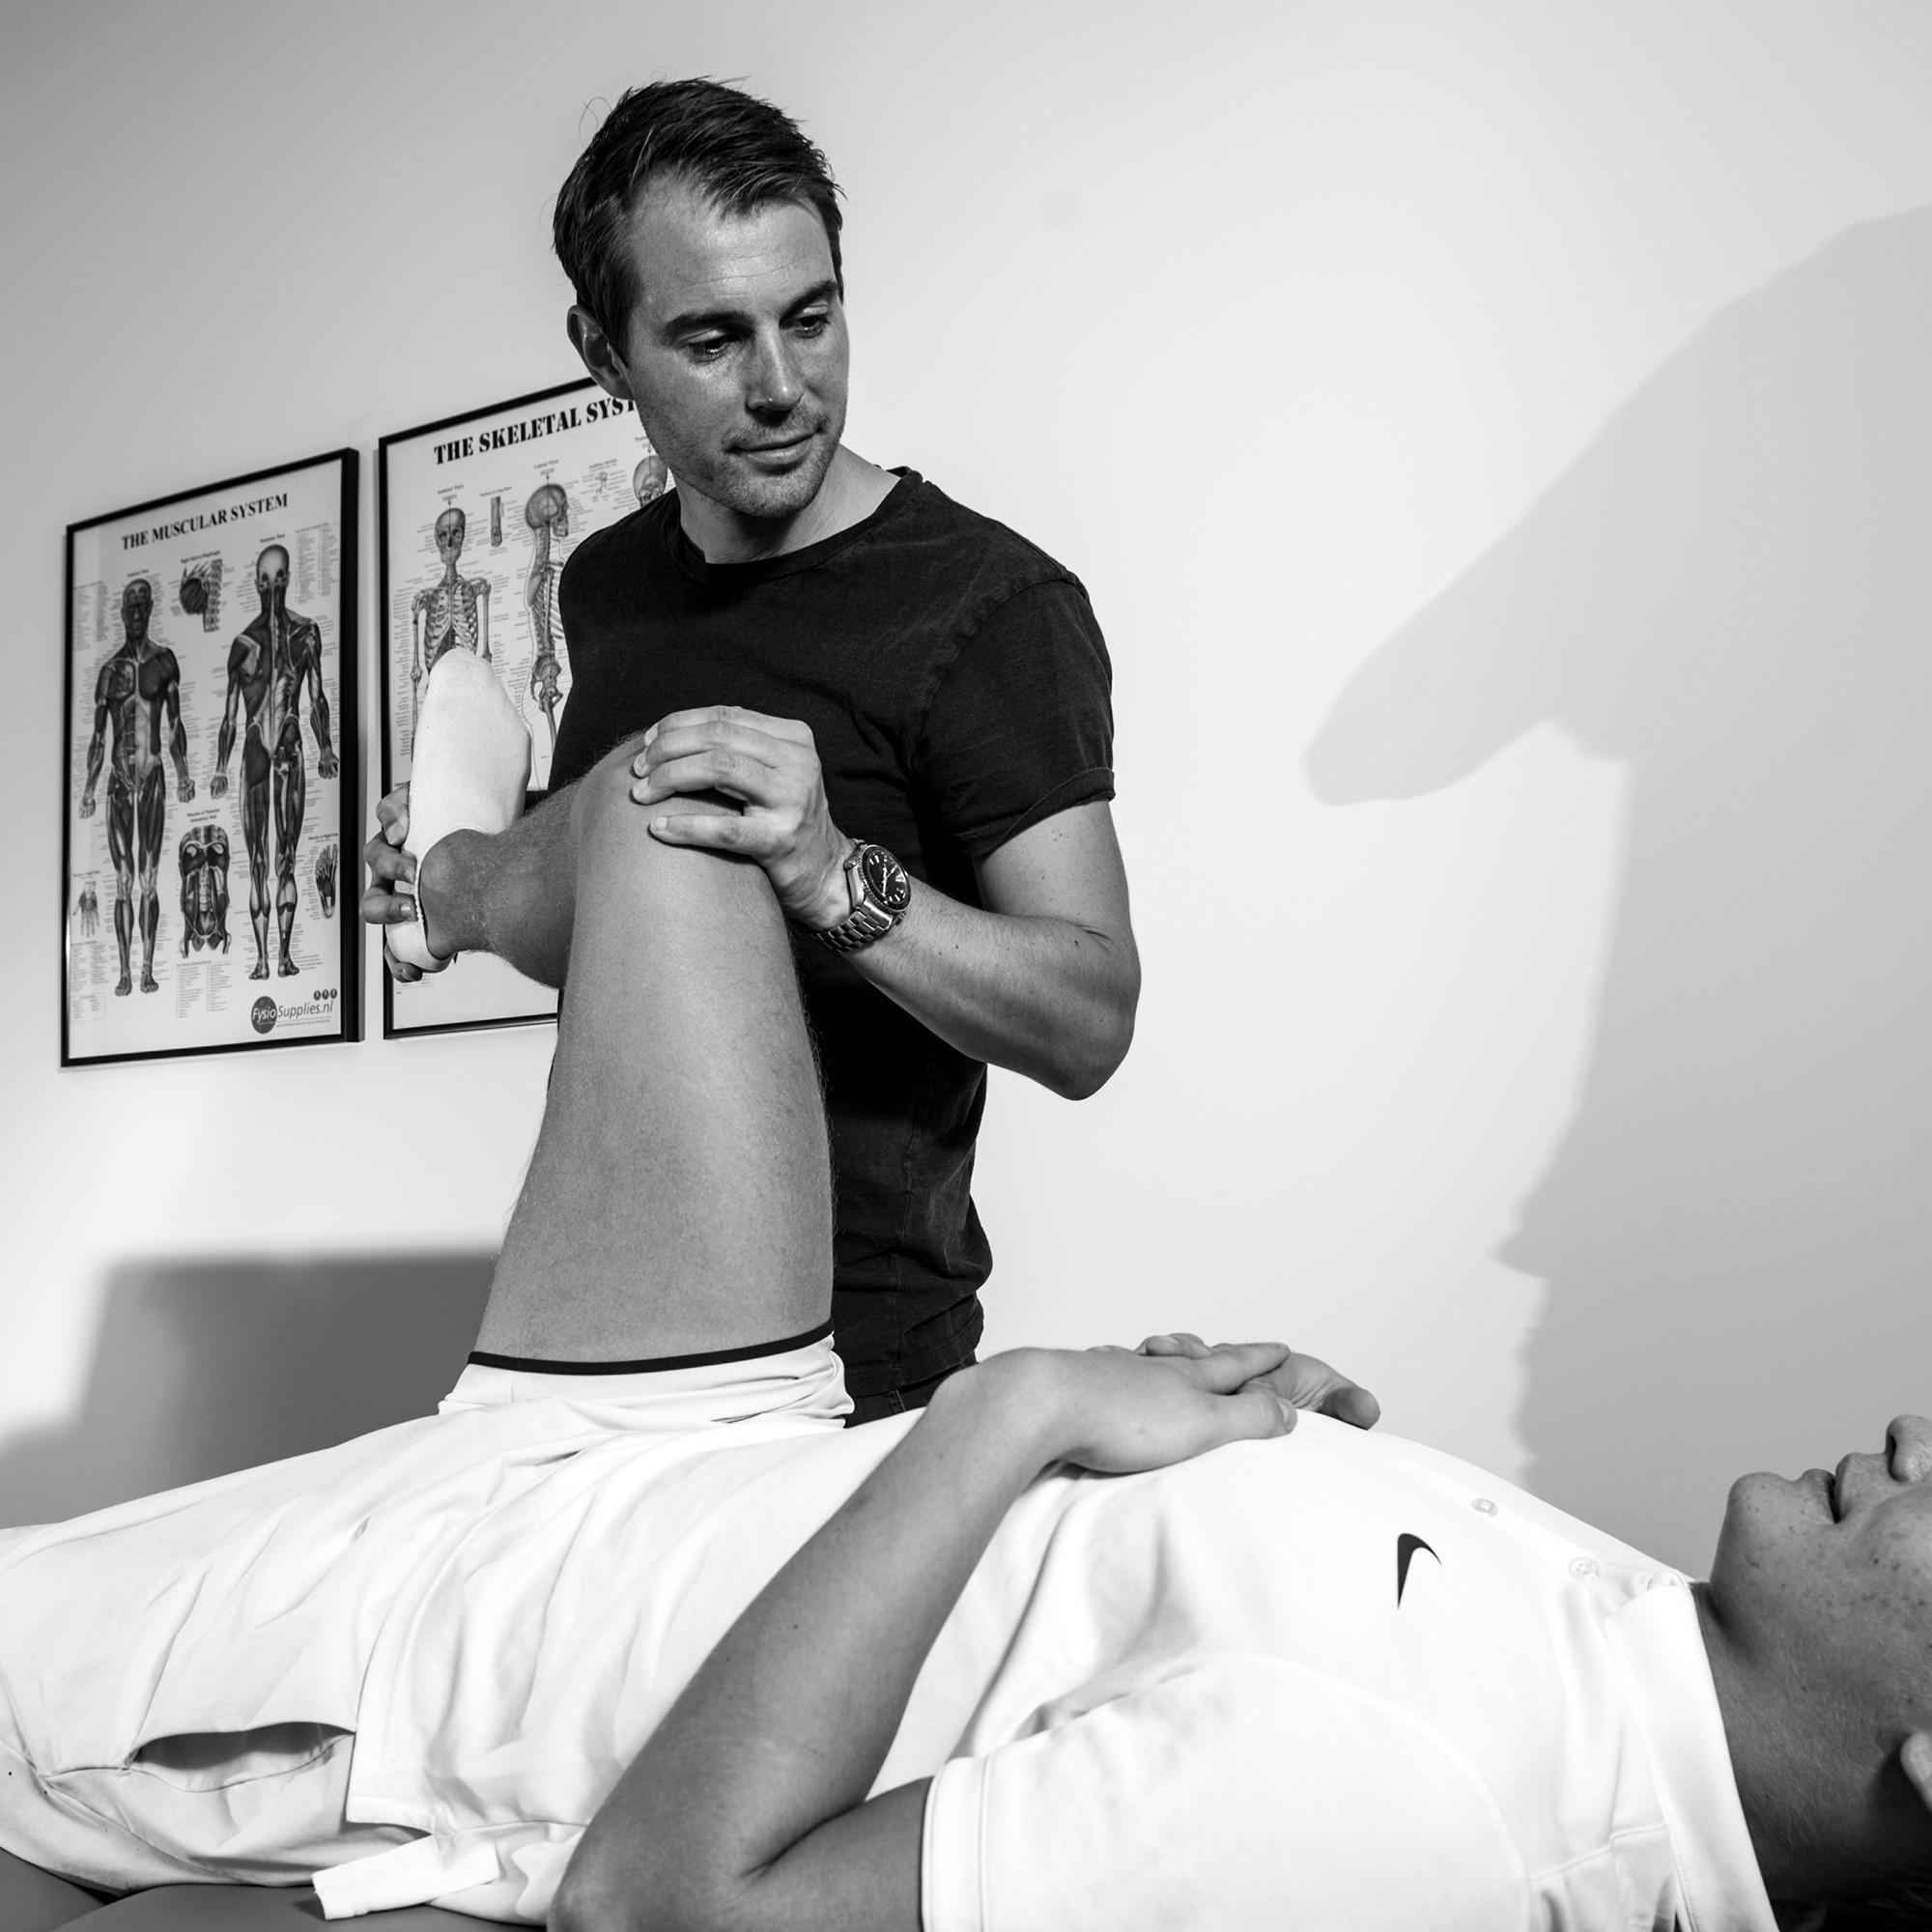 Fysioterapeut Mark Strøm, ejer af Sportsfysioterapien